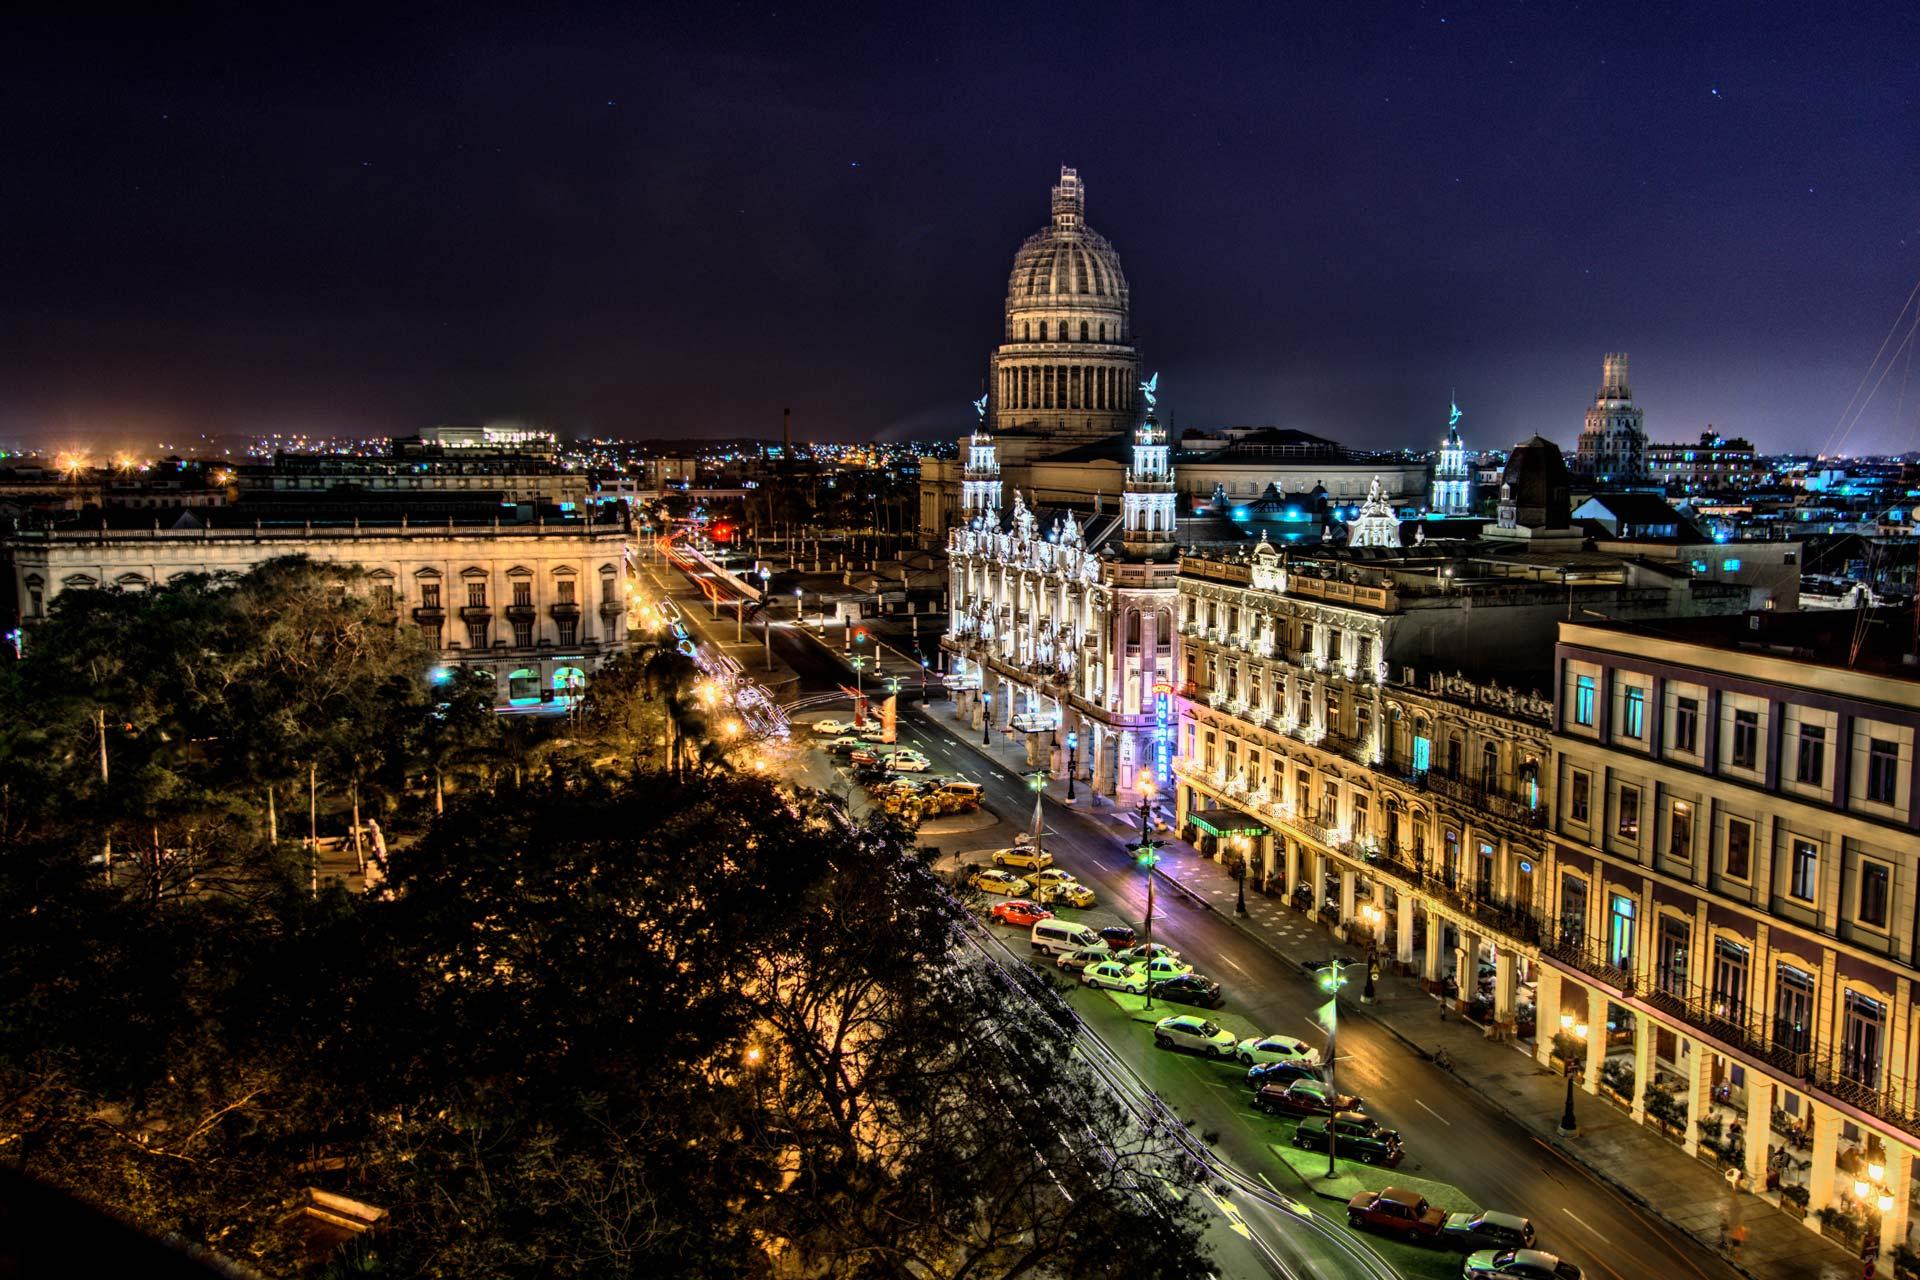 Reisefotografie - Havanna bei Nacht